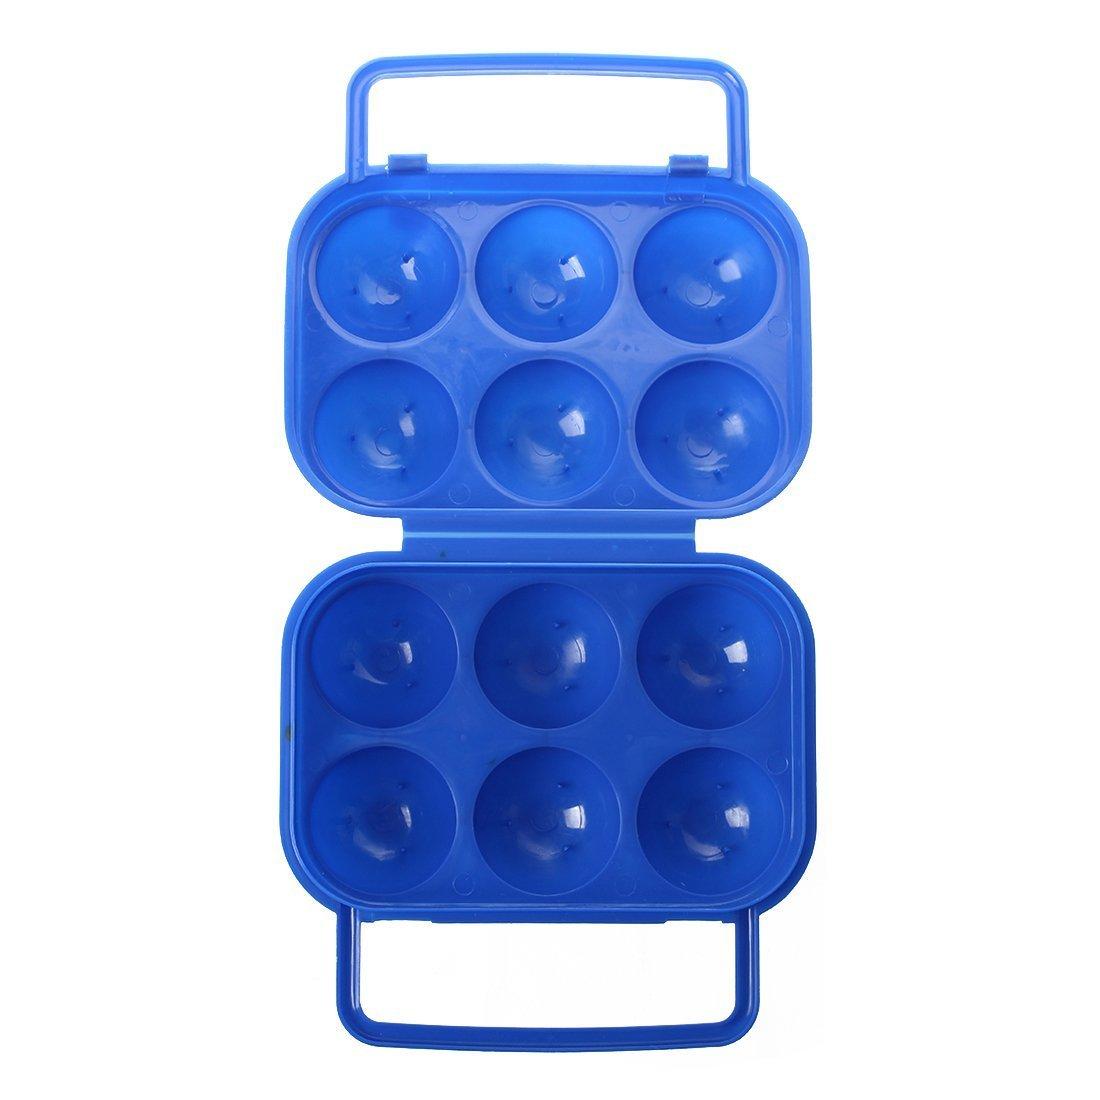 naranja Contenedor de almacenamiento portatiles de plastico plegable portador TOOGOO R